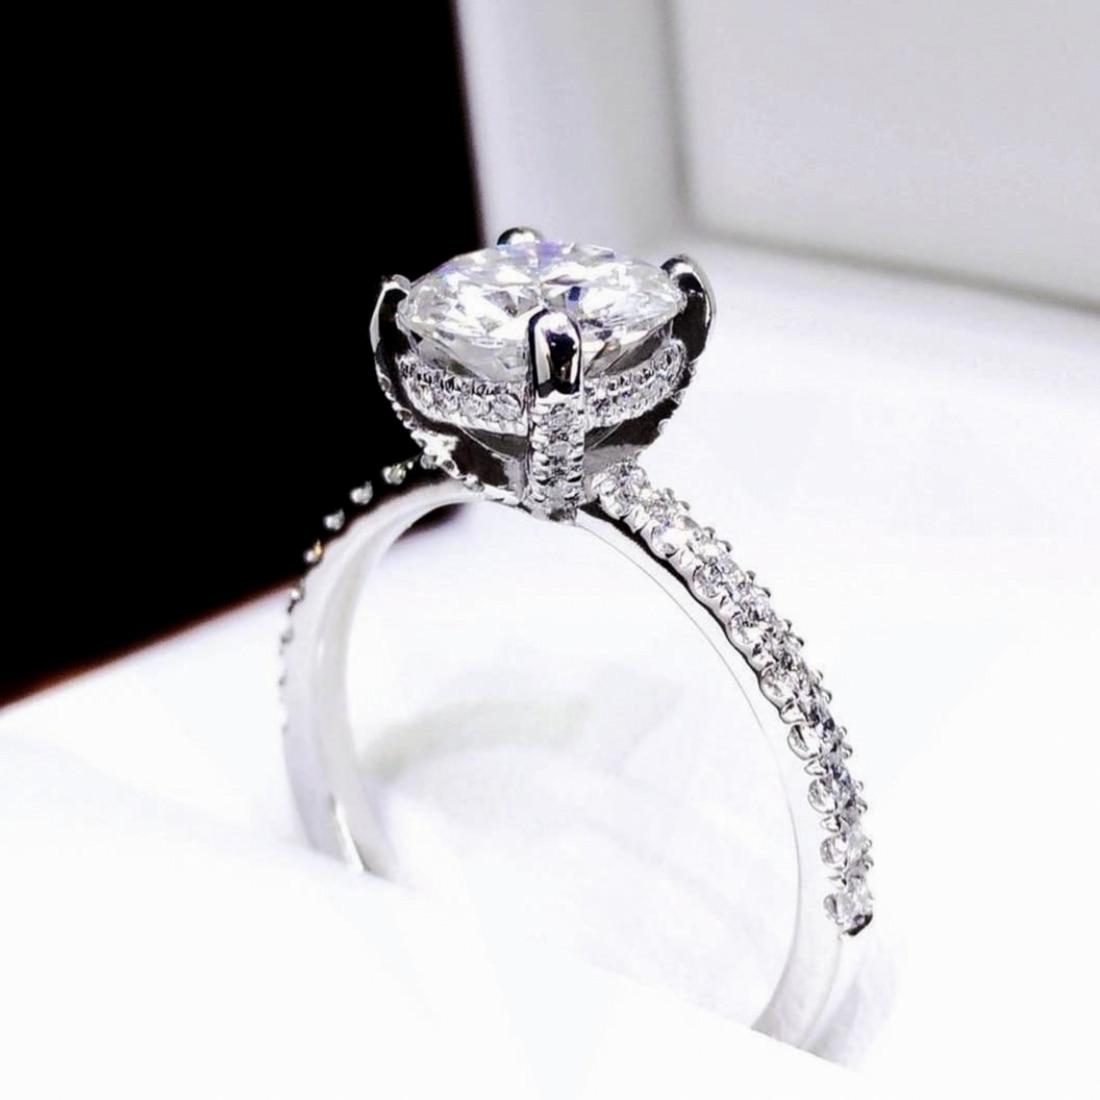 Original 925 Sterling Silver Ring finger 2Ct Cushion cut Diamond Wedding Engagement Rings For Women Topaz gemstone Fine Jewelry